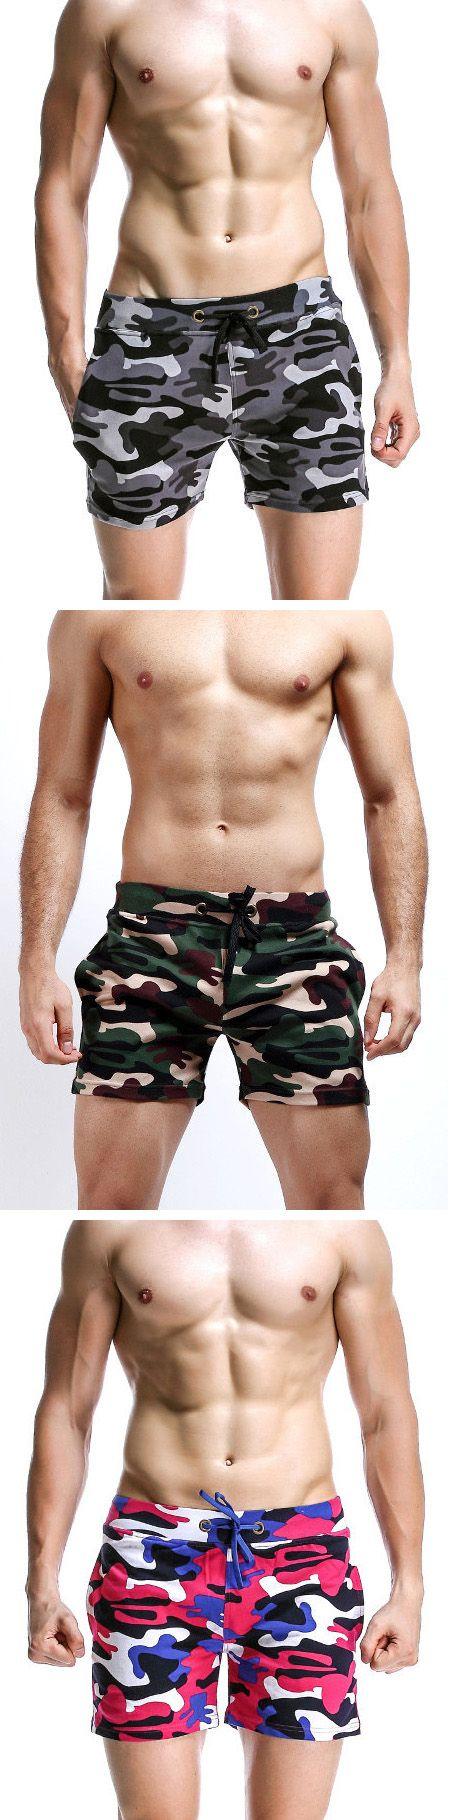 Mens Camo Home Shorts Breathable Elastic Waist Drawstring Casual Sports Shorts